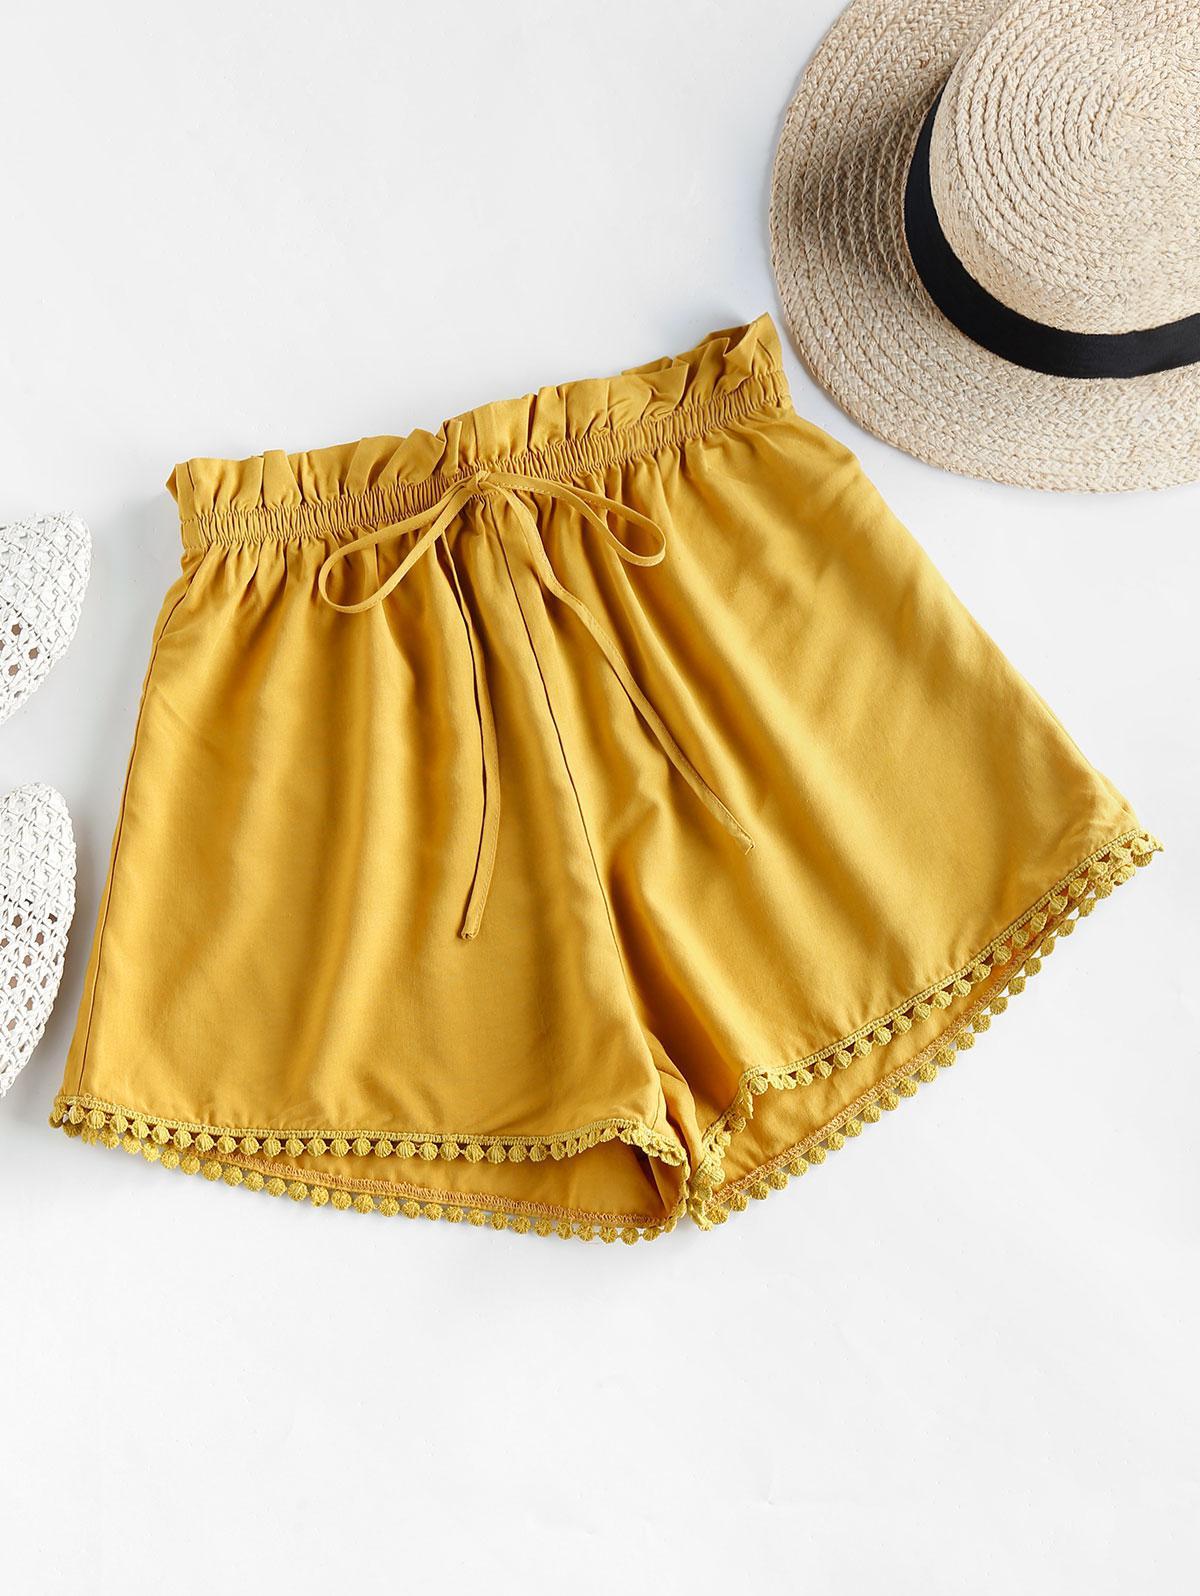 ZAFUL Crochet Trim Frilled Tie Shorts